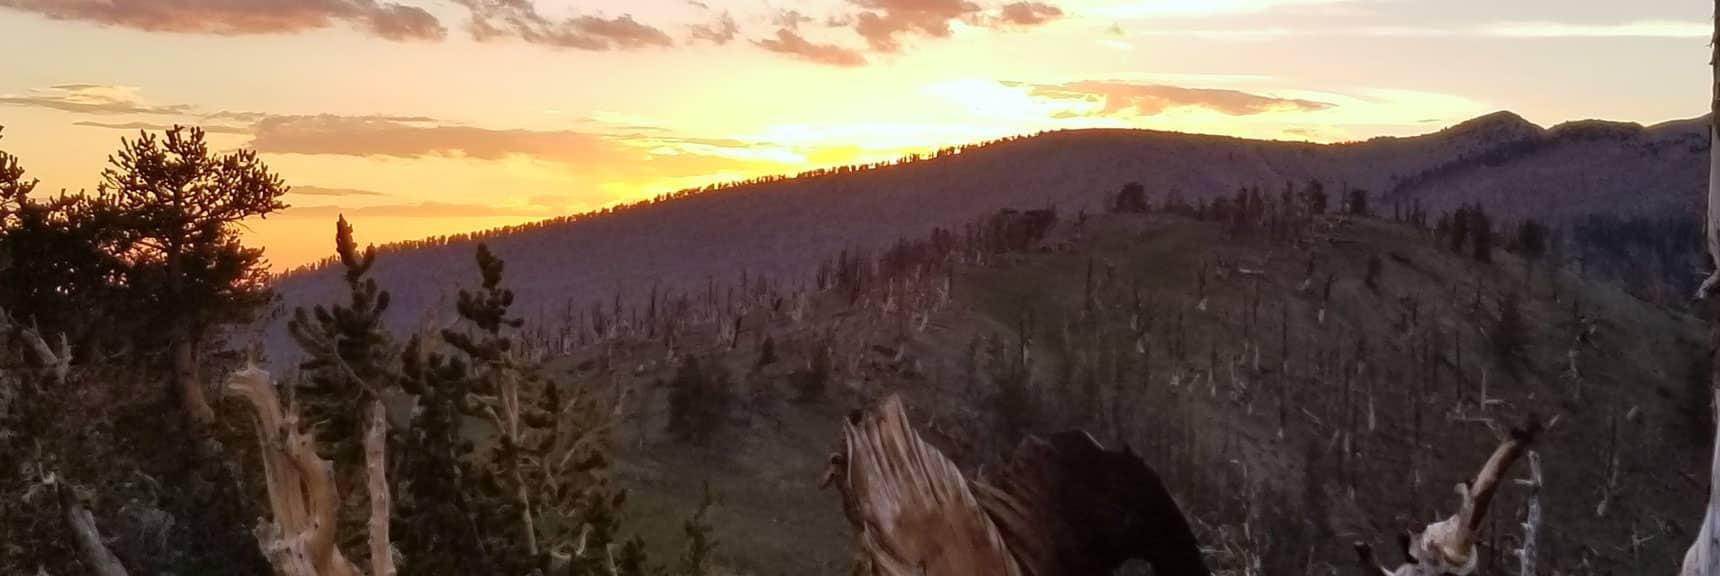 Sunset View Toward Charleston Peak from Kyle Canyon South Ridge | Six Peak Circuit Adventure in the Spring Mountains, Nevada